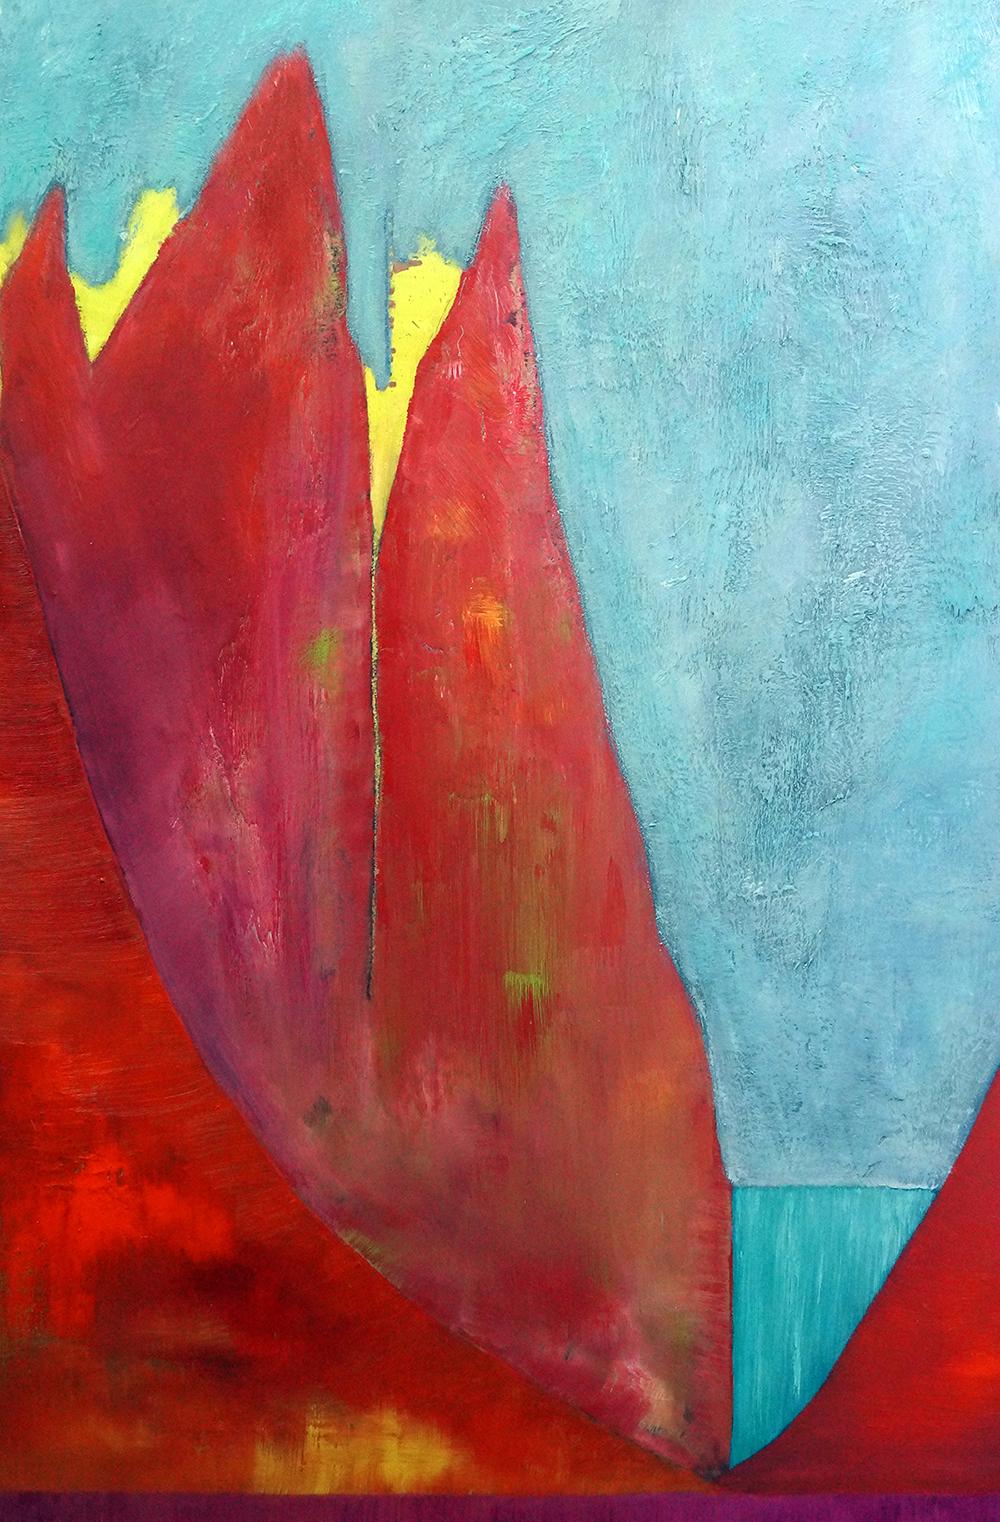 Red Raw - Oil on Panel - 91.5cm x 61cm